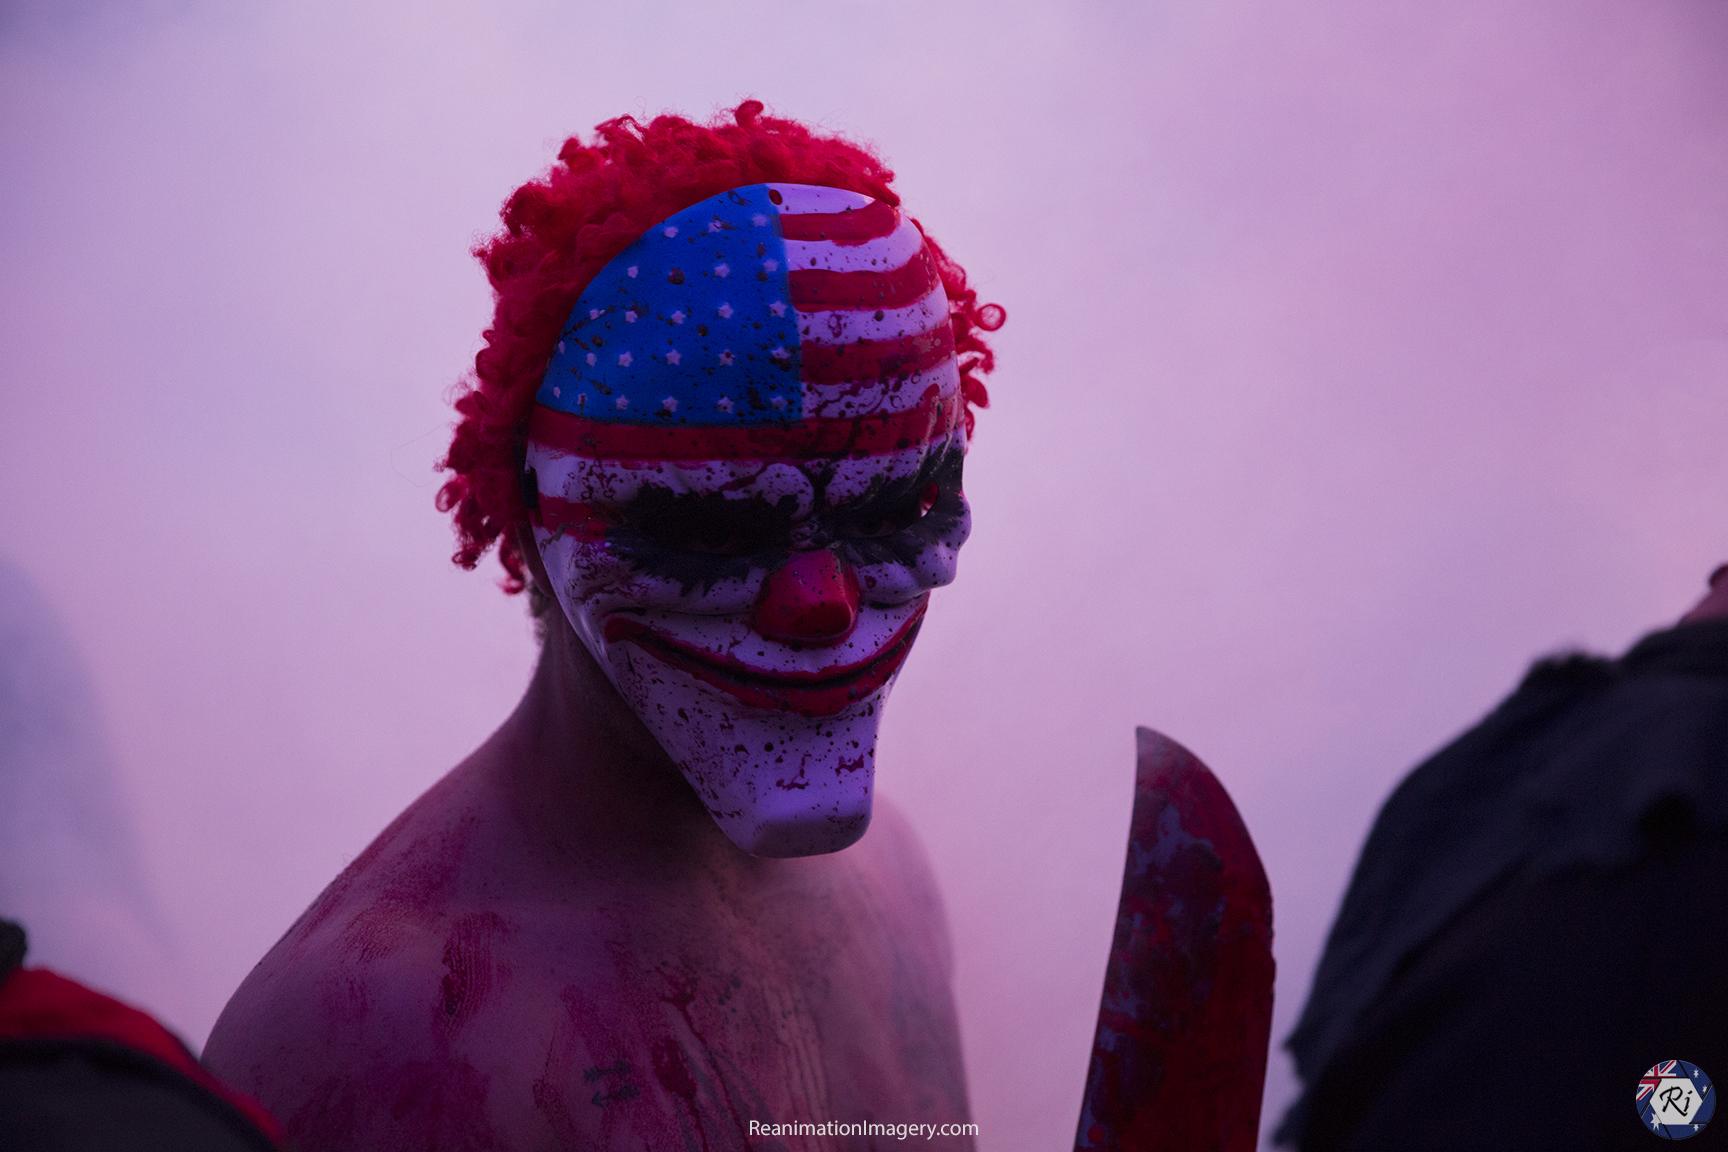 Everyone Loves Clowns